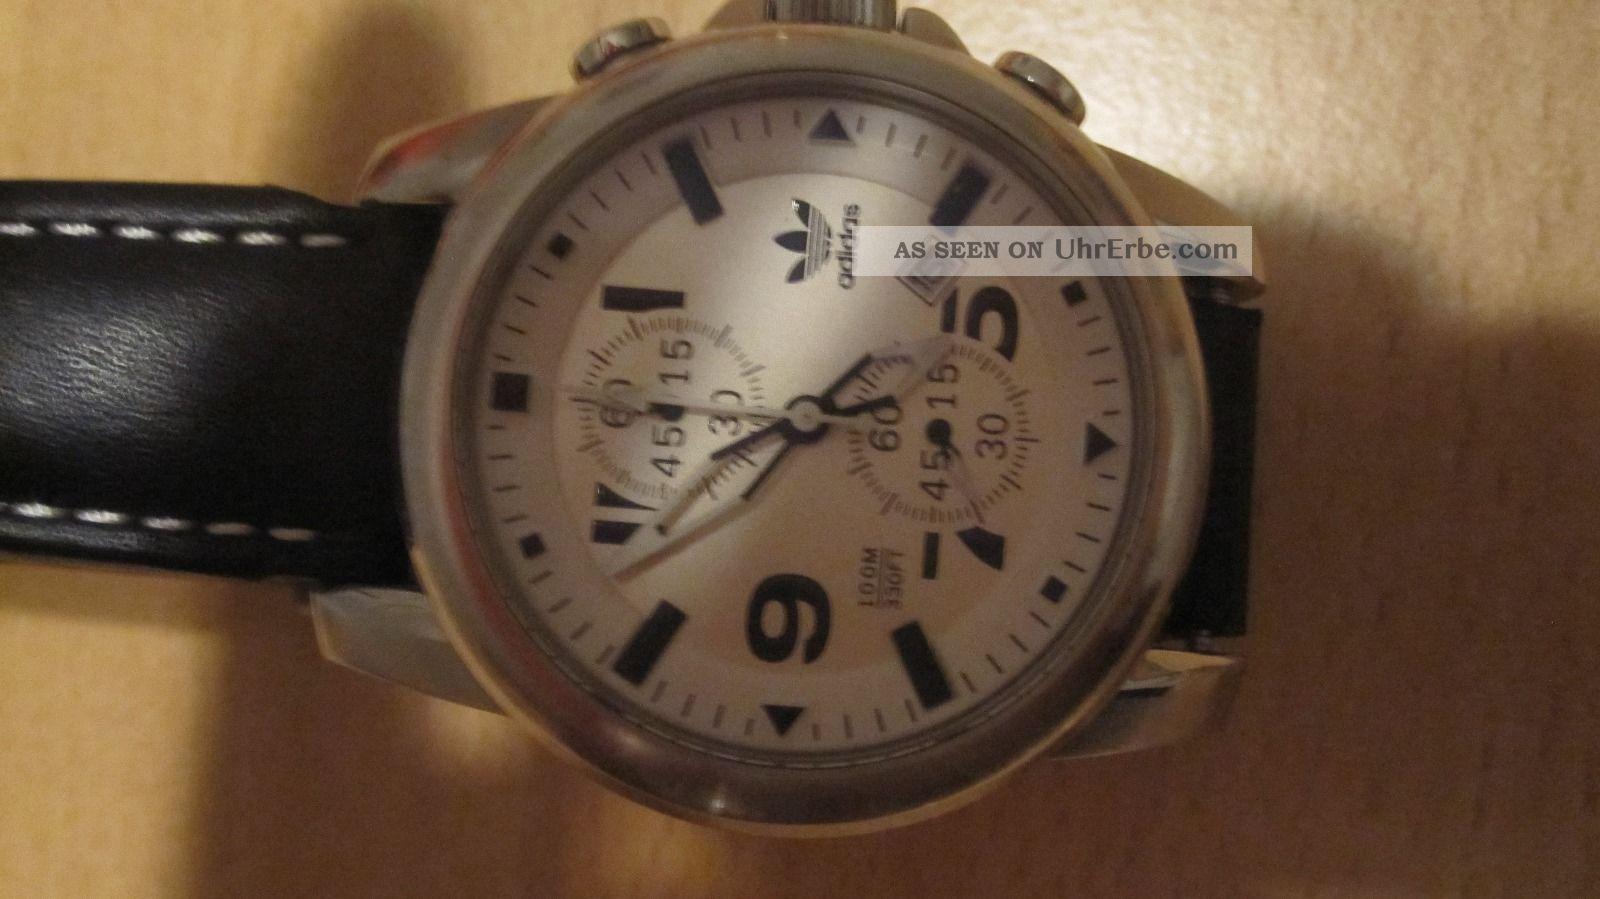 Herrencronograph - - Adidas - - Armbanduhren Bild